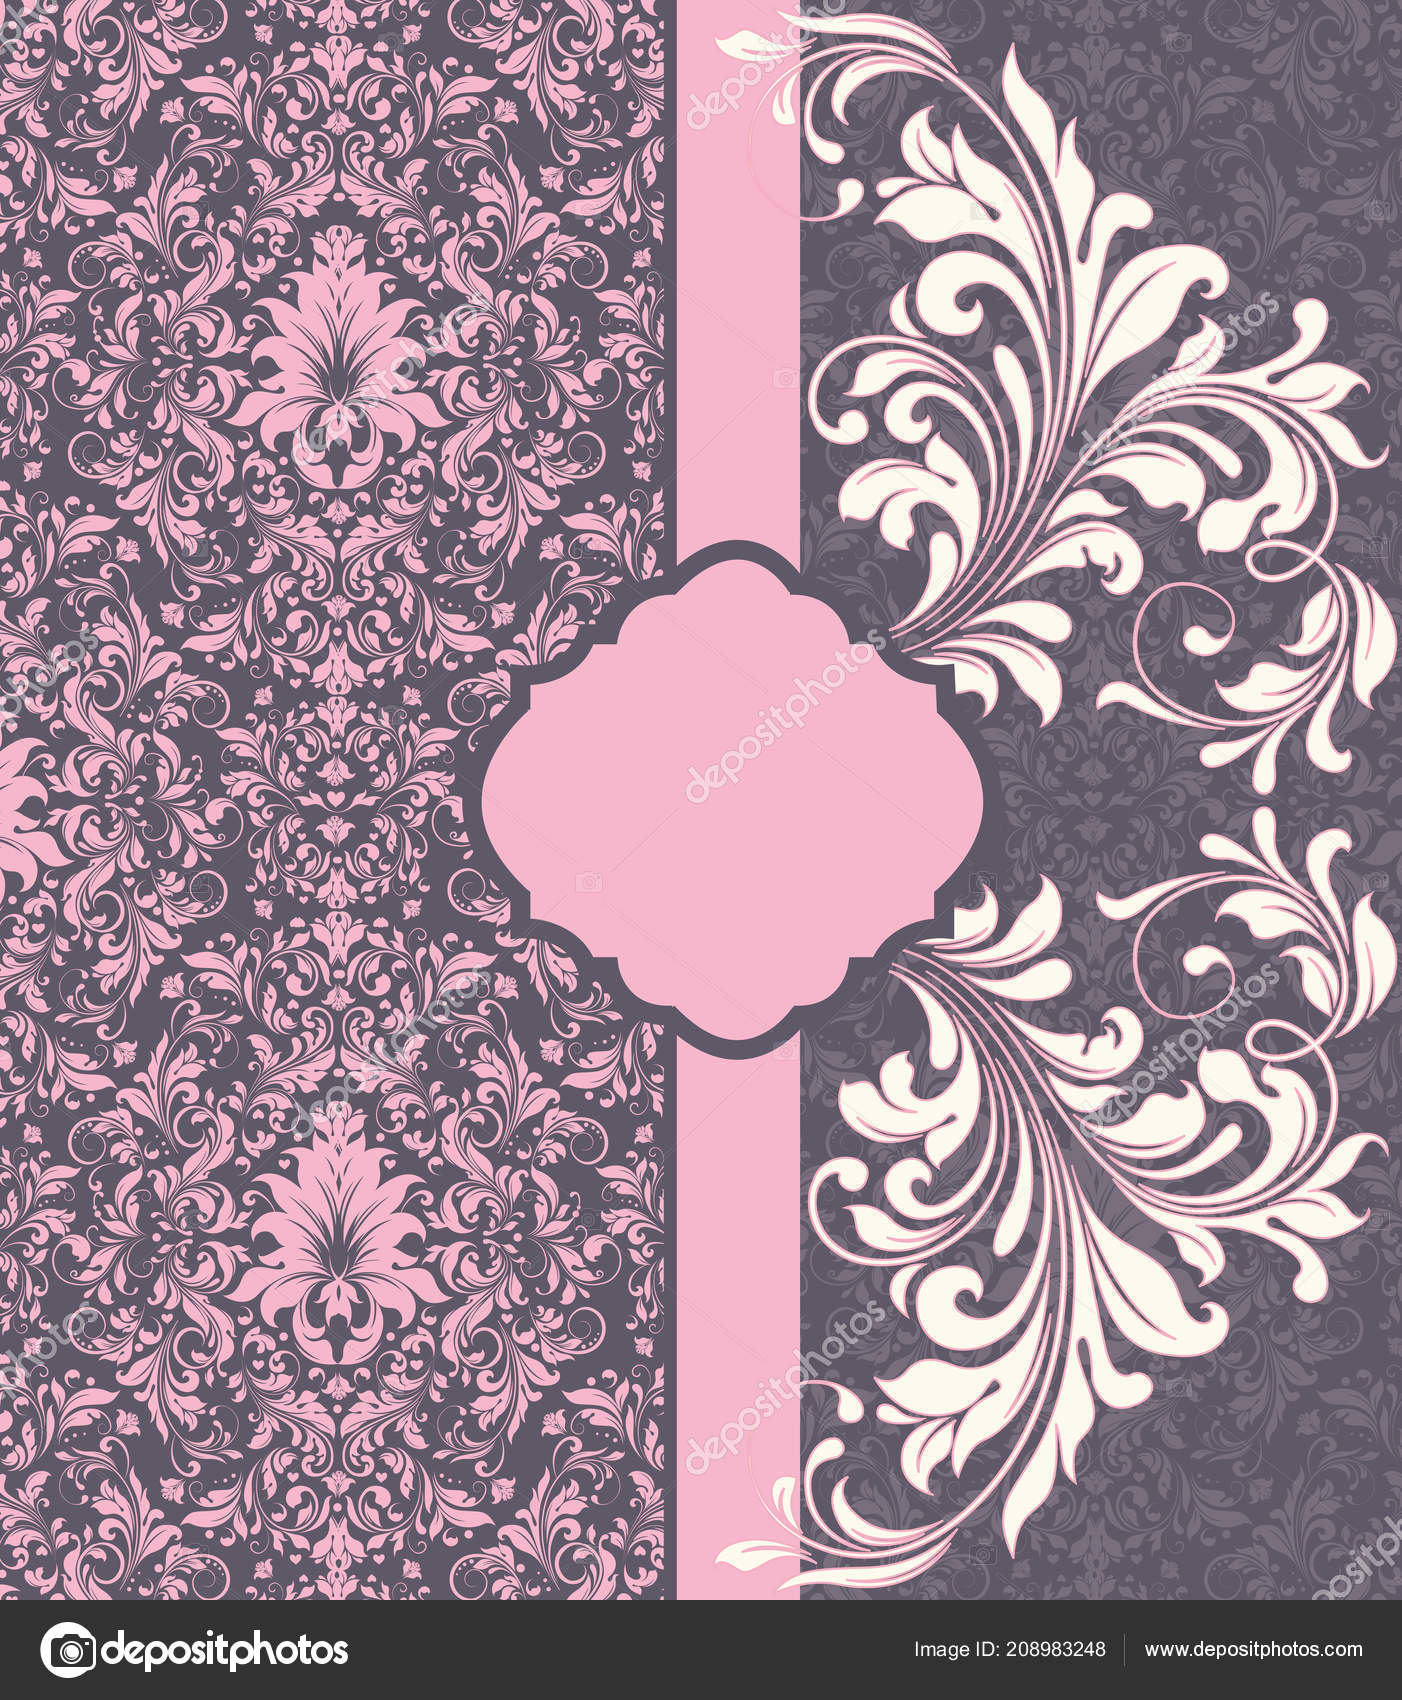 https depositphotos com 208983248 stock illustration vintage invitation card ornate elegant html